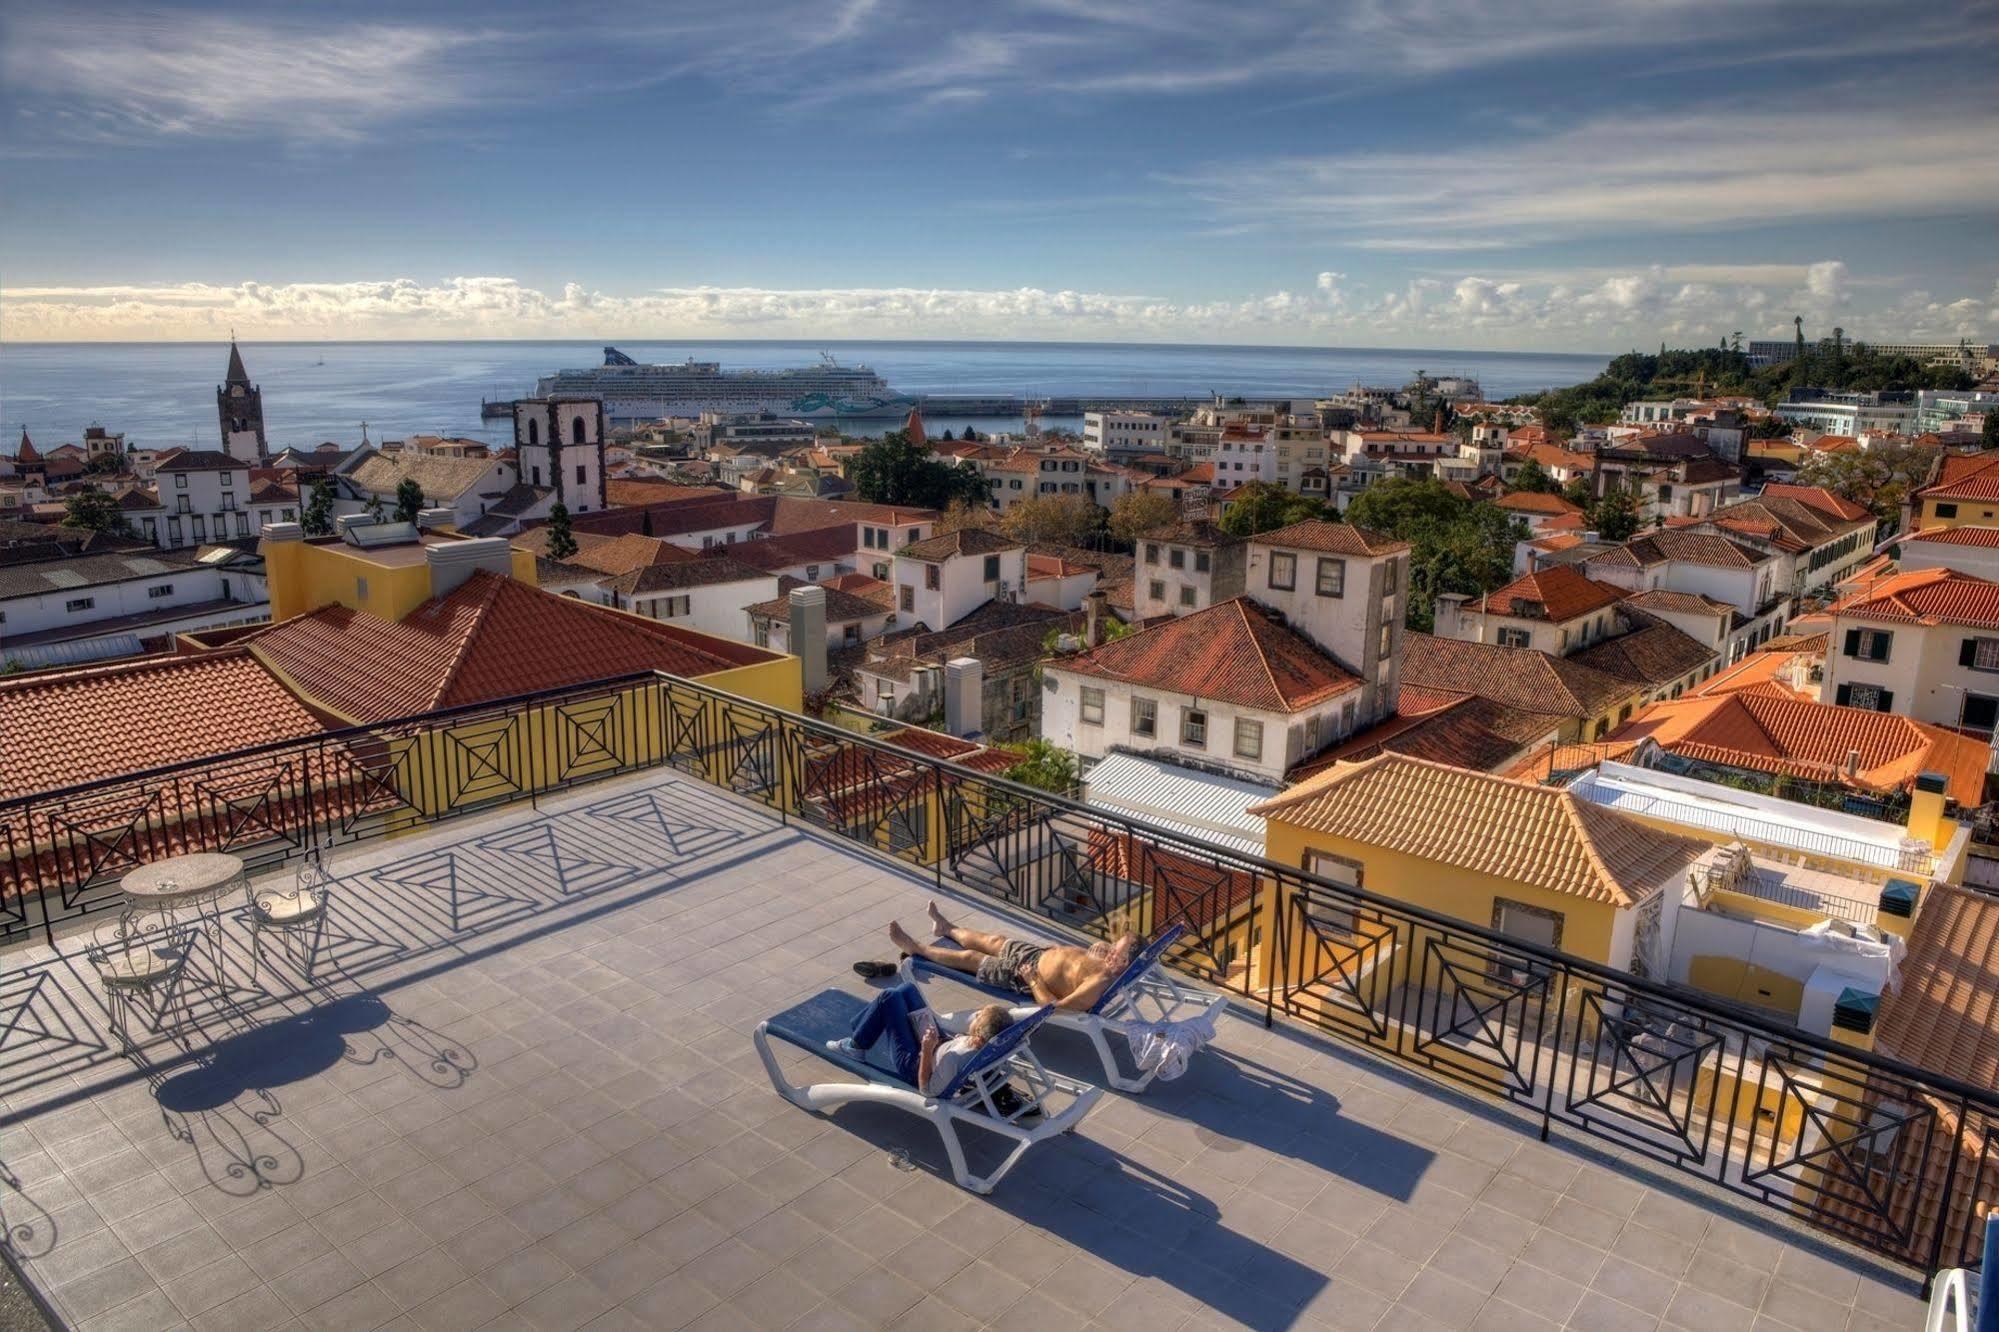 HOTEL ORQUIDEA FUNCHAL - Funchal (Madeira), Portugal on